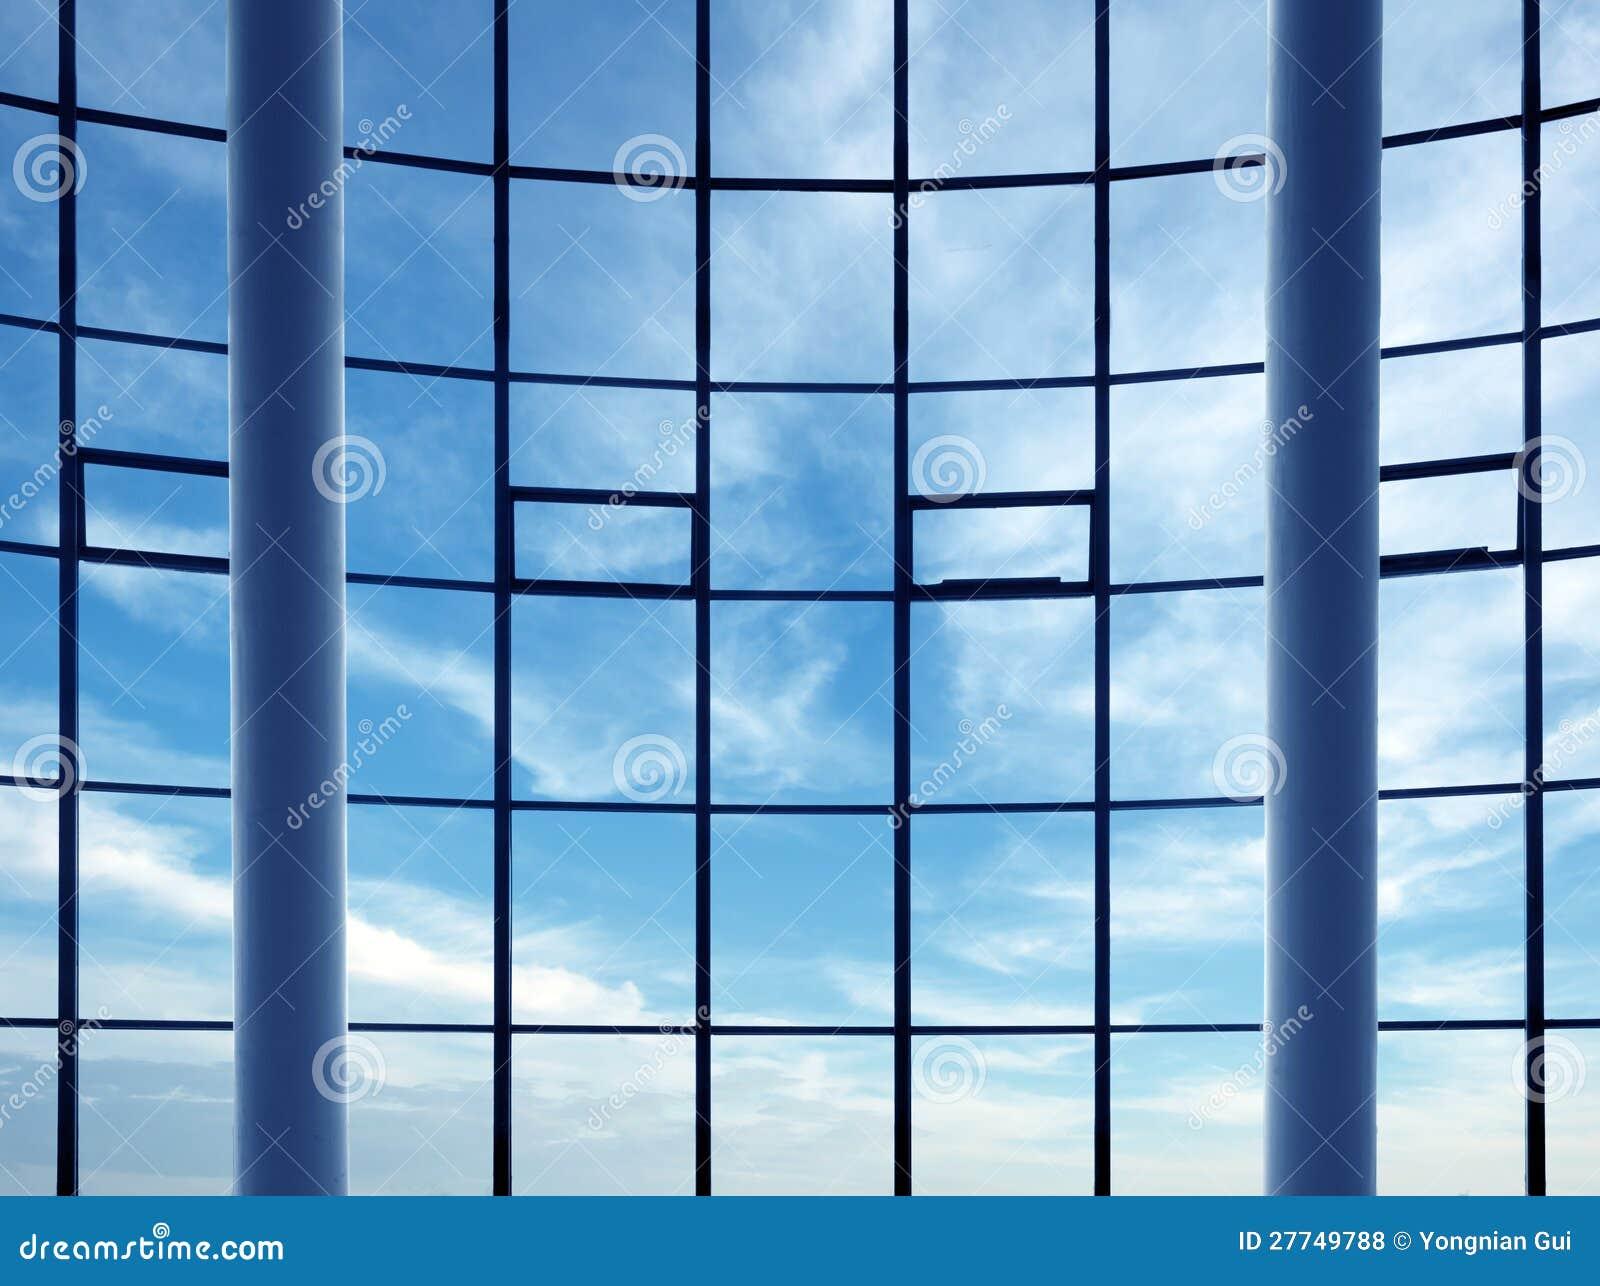 Modern Building Indoor: Office Window Royalty Free Stock ...